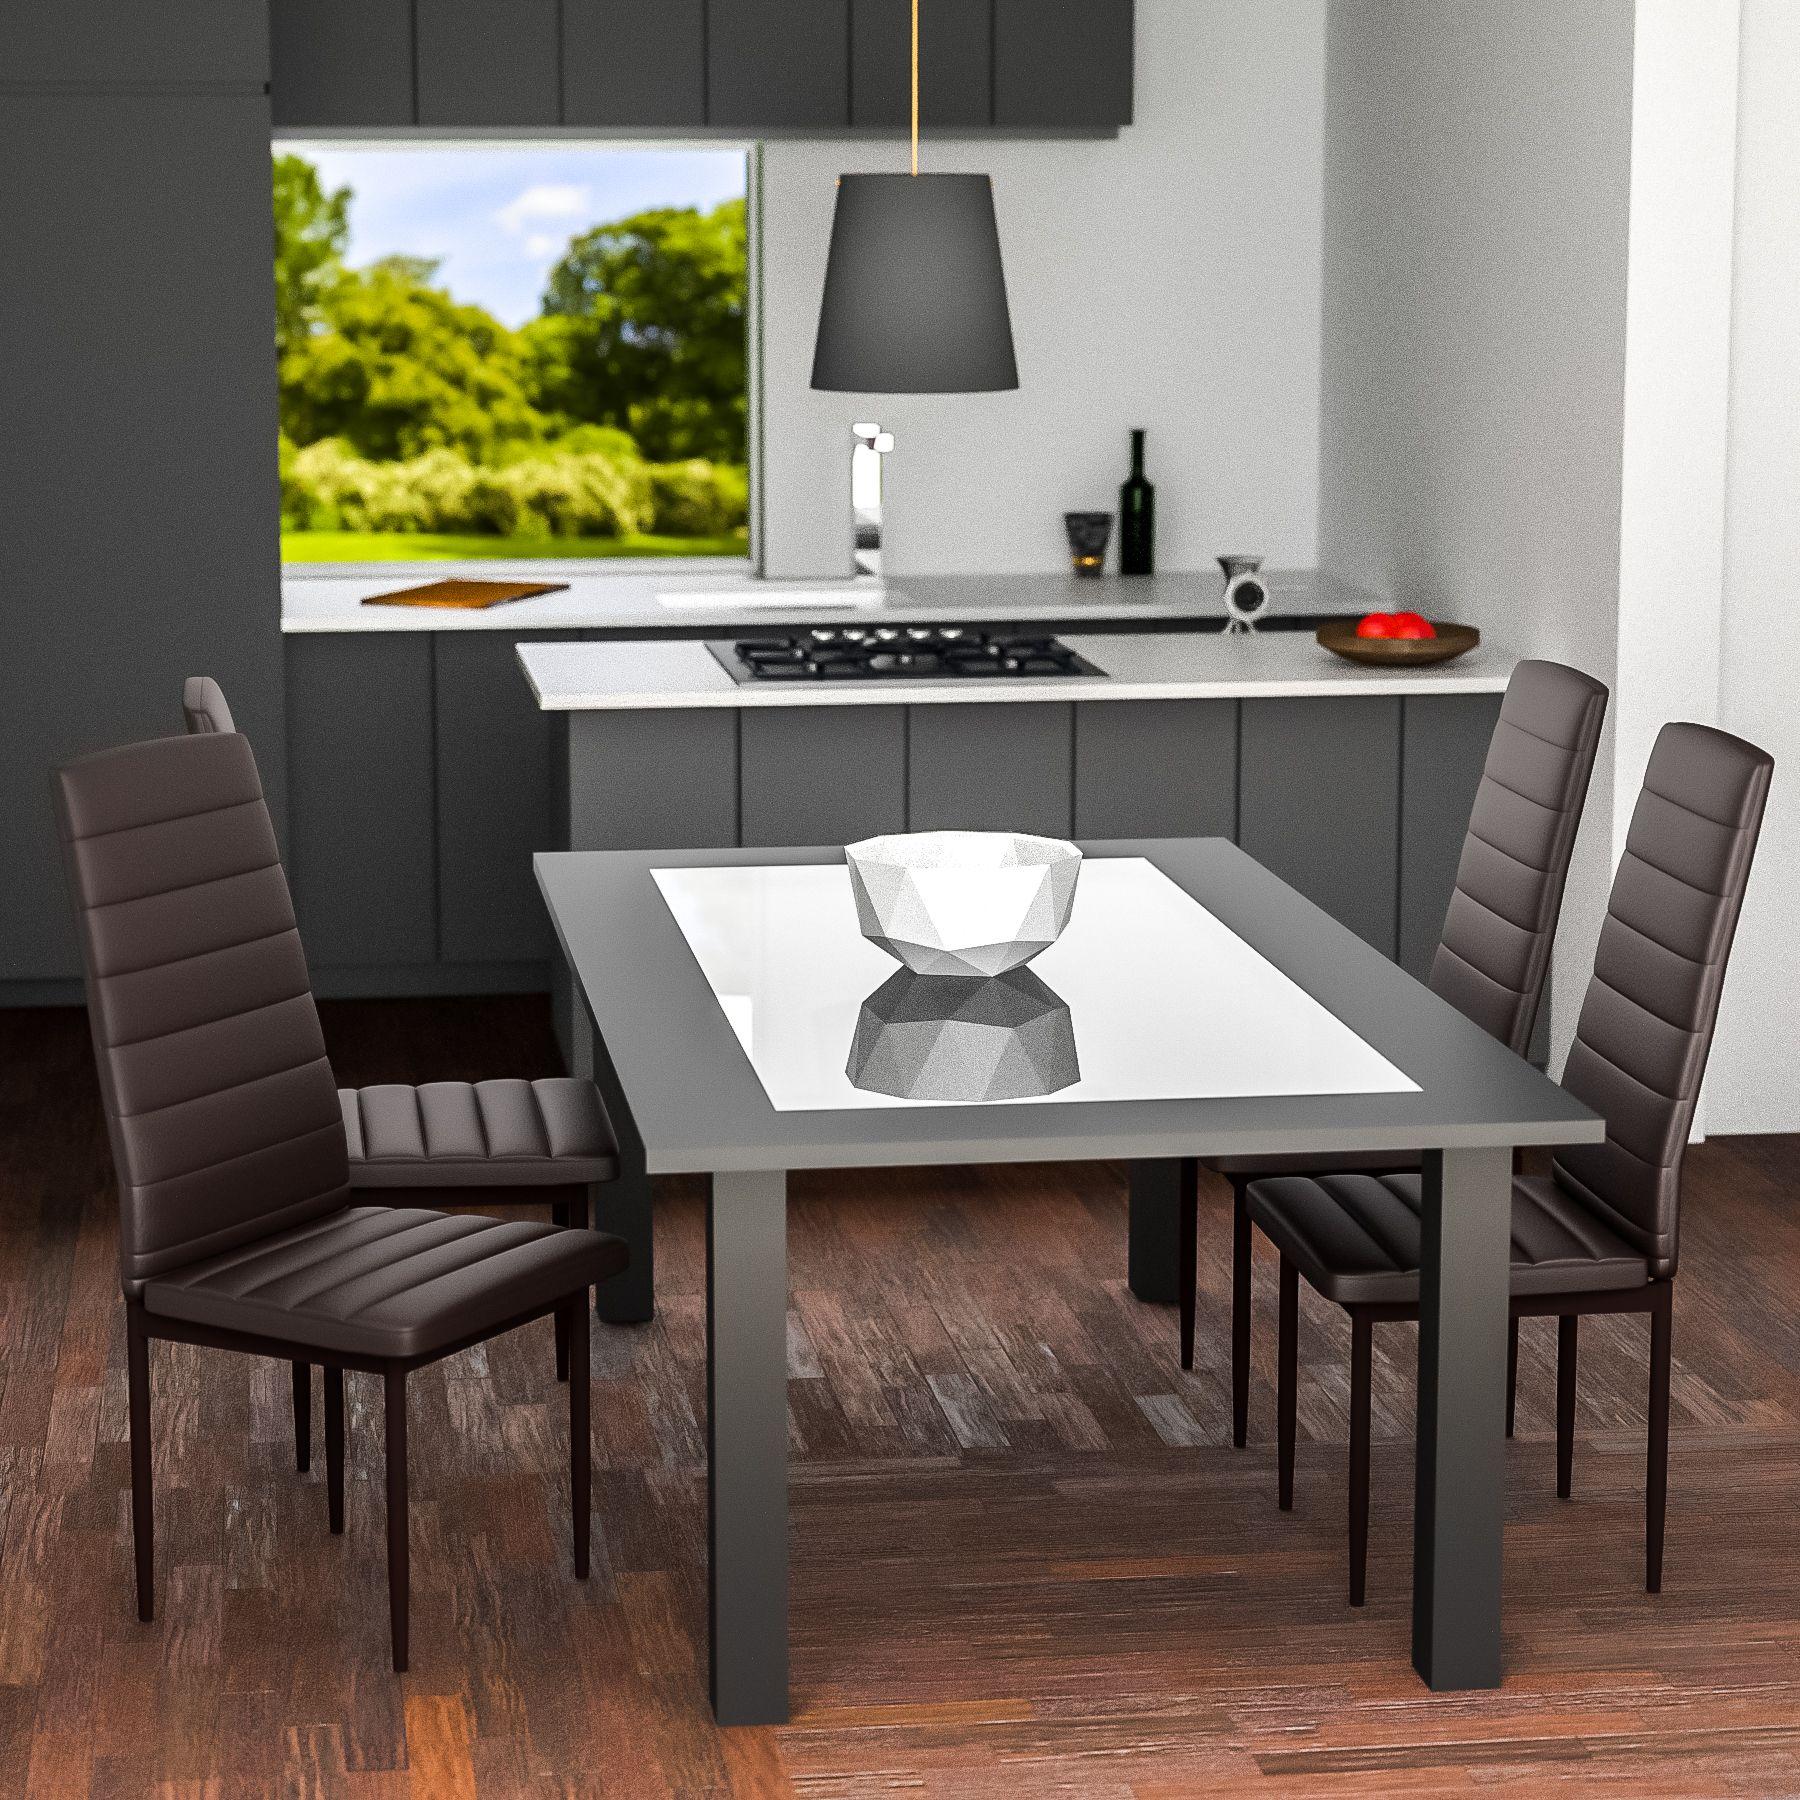 Tavoli Eleganti Sala Da Pranzo dettagli su set di 4 sedia per sala da pranzo tavolo cucina eleganti  moderne robusto marrone